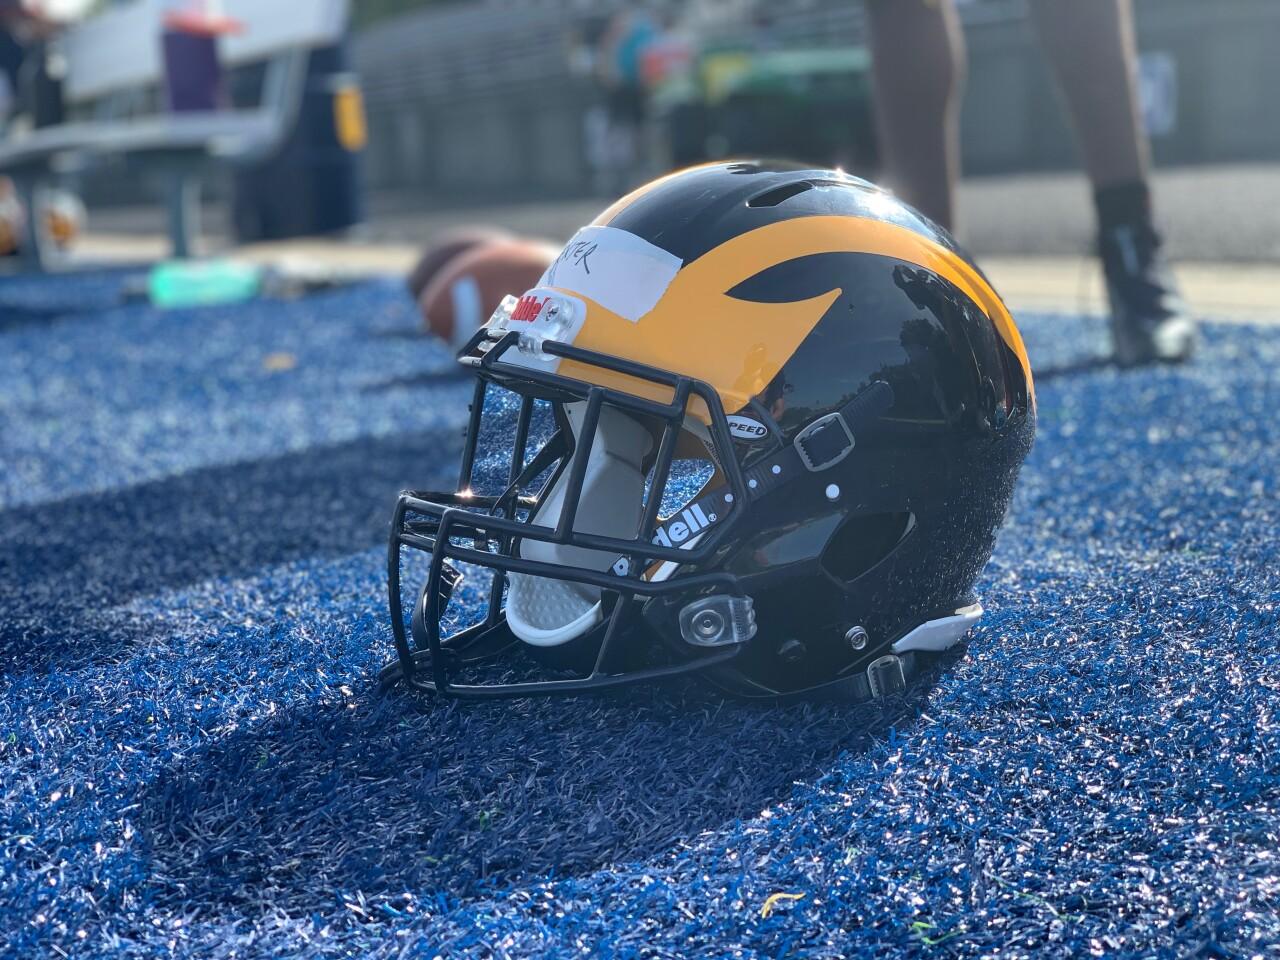 Godwin-Heights-Wolverines-varsity-football-practice-helmet-on-sideline-September-11-2020.jpg